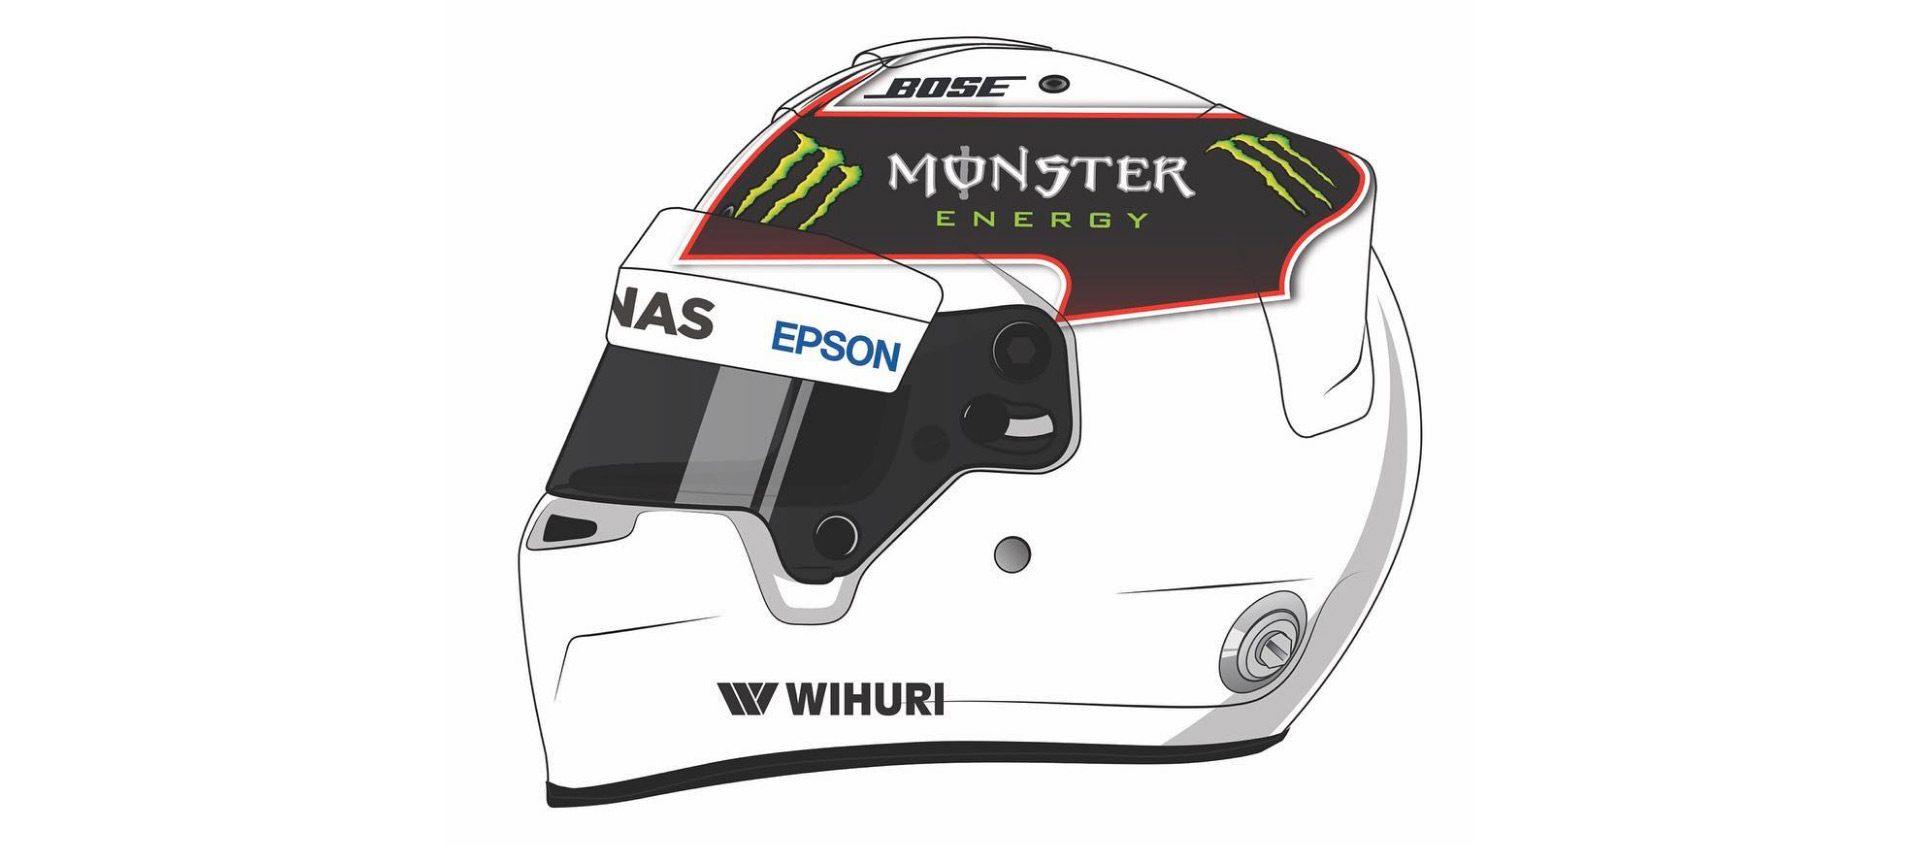 Lewis Hamilton's Race Helmet Competition Inspires Wacky Designs